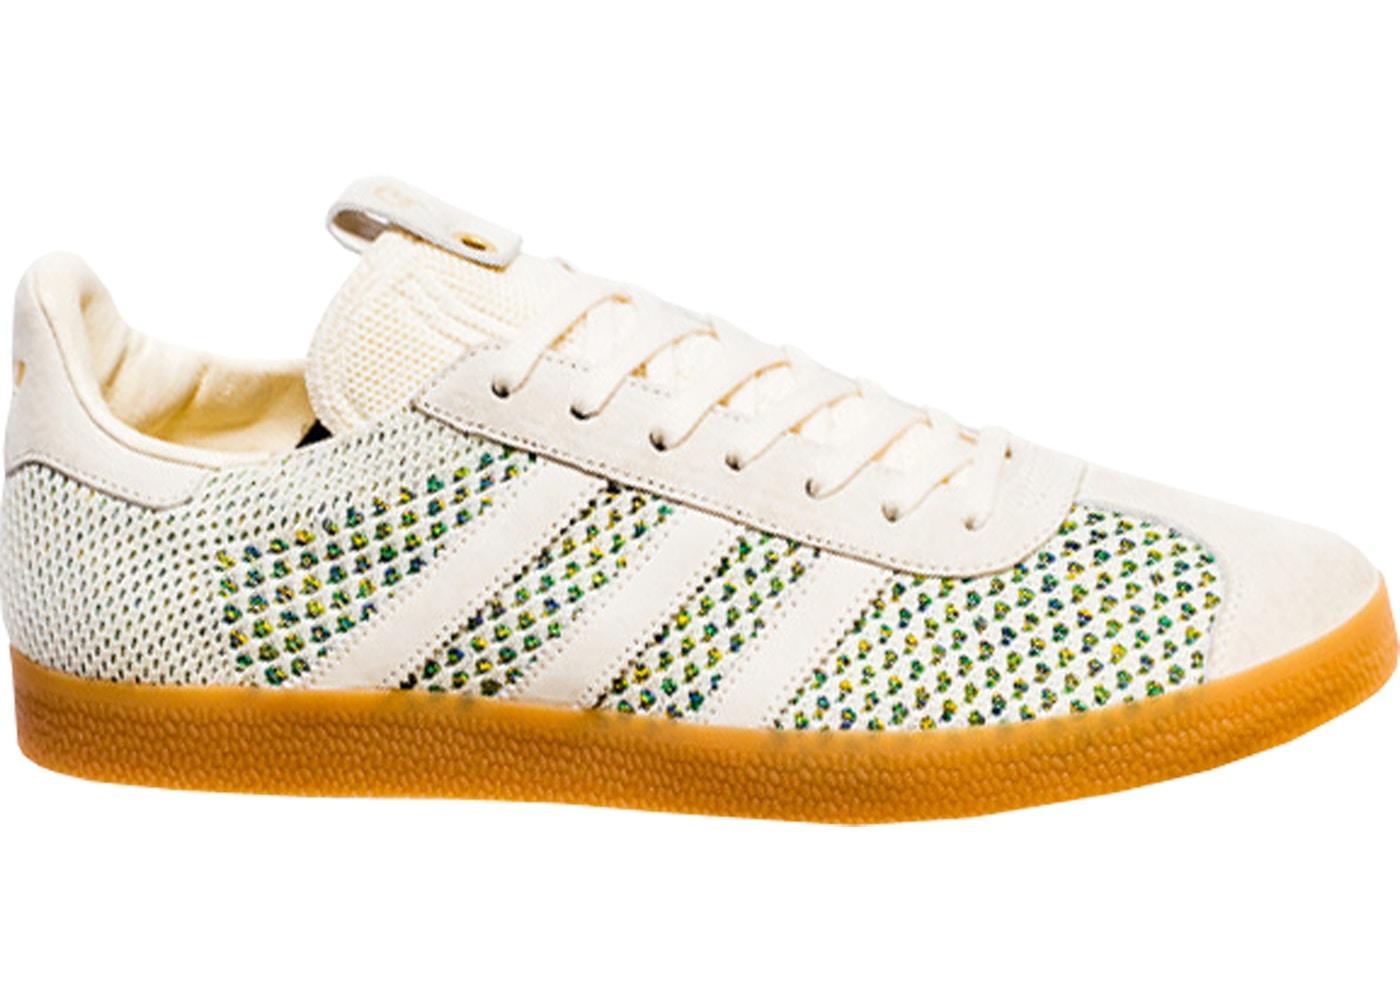 Gazelle Gras Adidas Politics Sneaker By2831 Mardi WIeD9bEH2Y